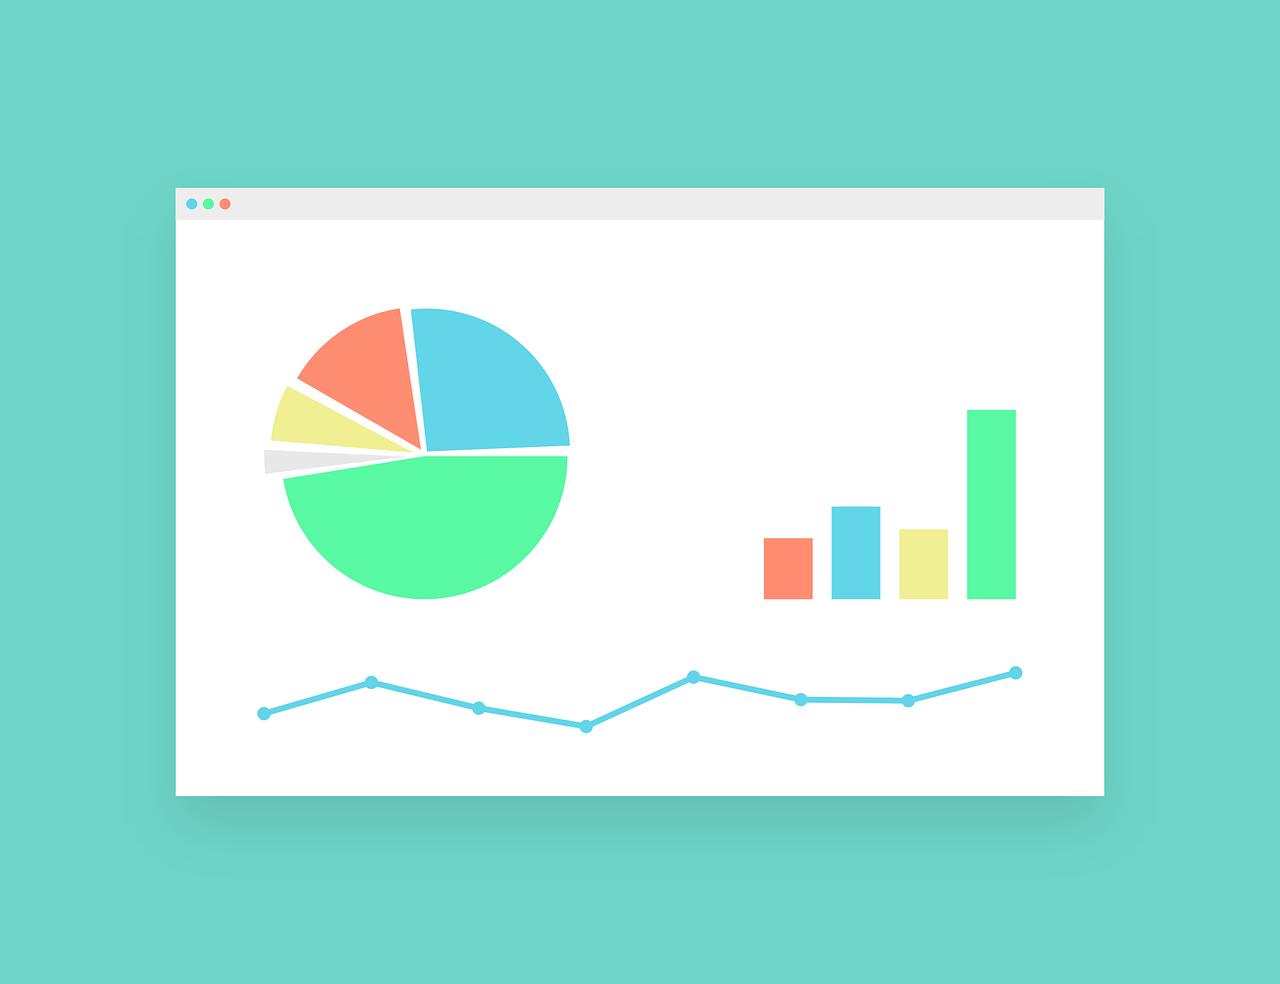 Project: Marketing Analysis